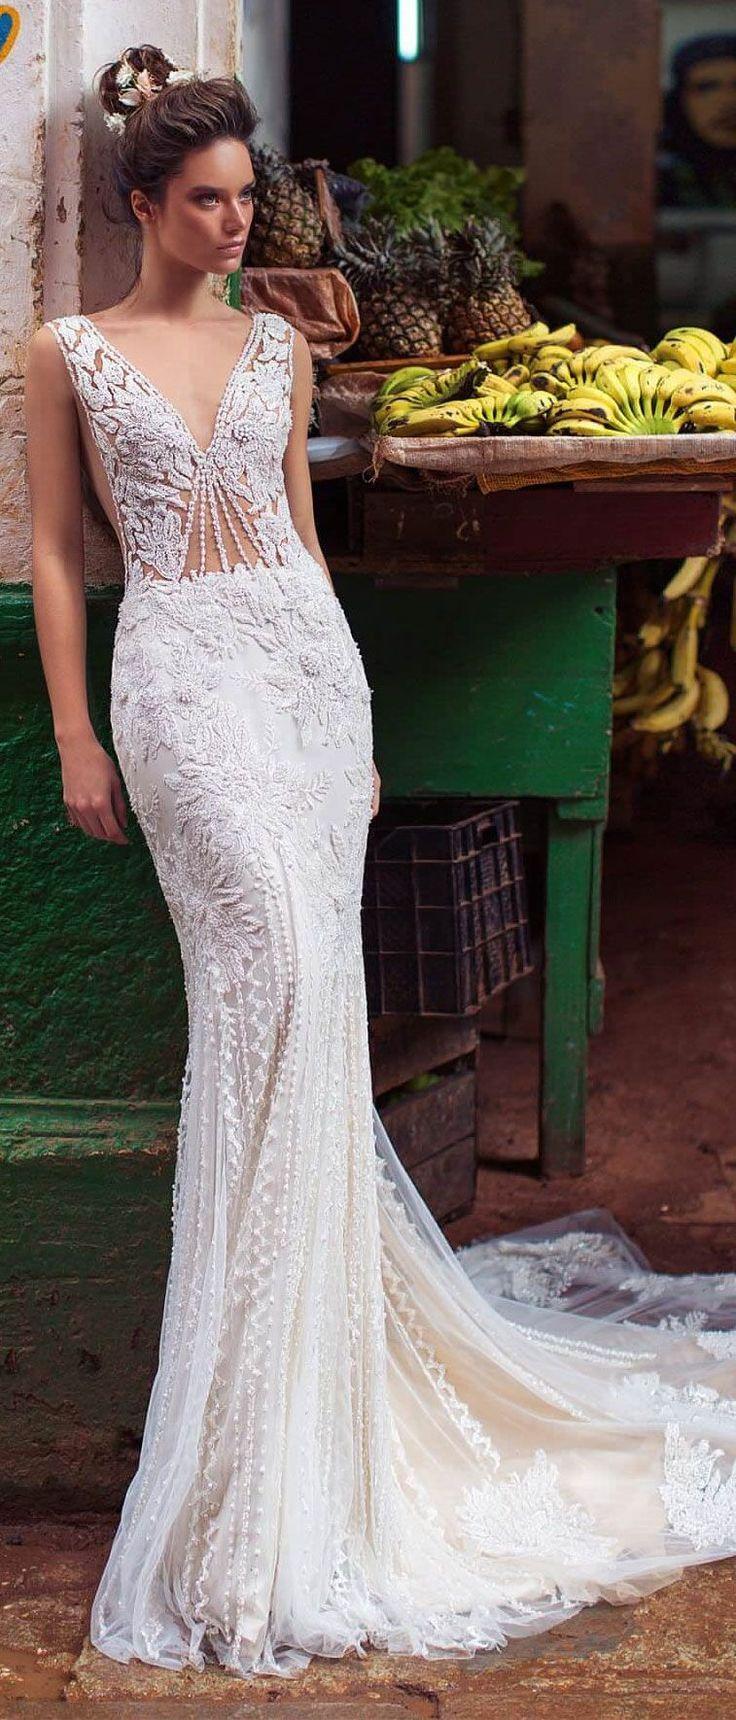 Boda - Wedding Dress Inspiration